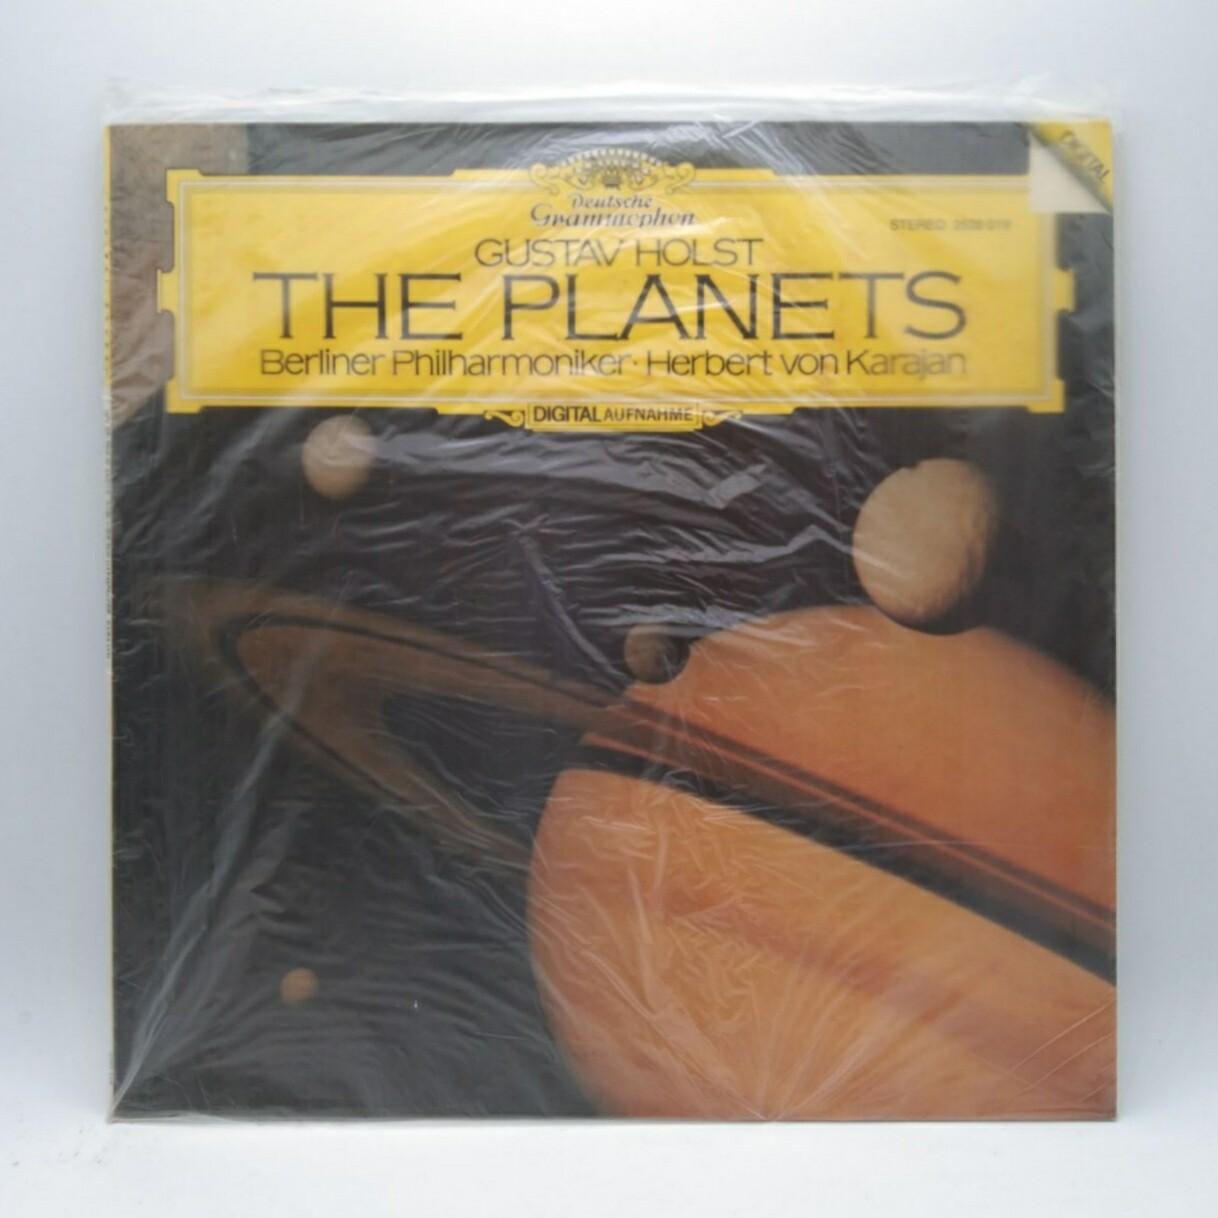 [USED] GUSTAV HOLST•BERLINER PHILHARMONIKER•HERBERT VON KARAJAN -THE PLANETS- LP